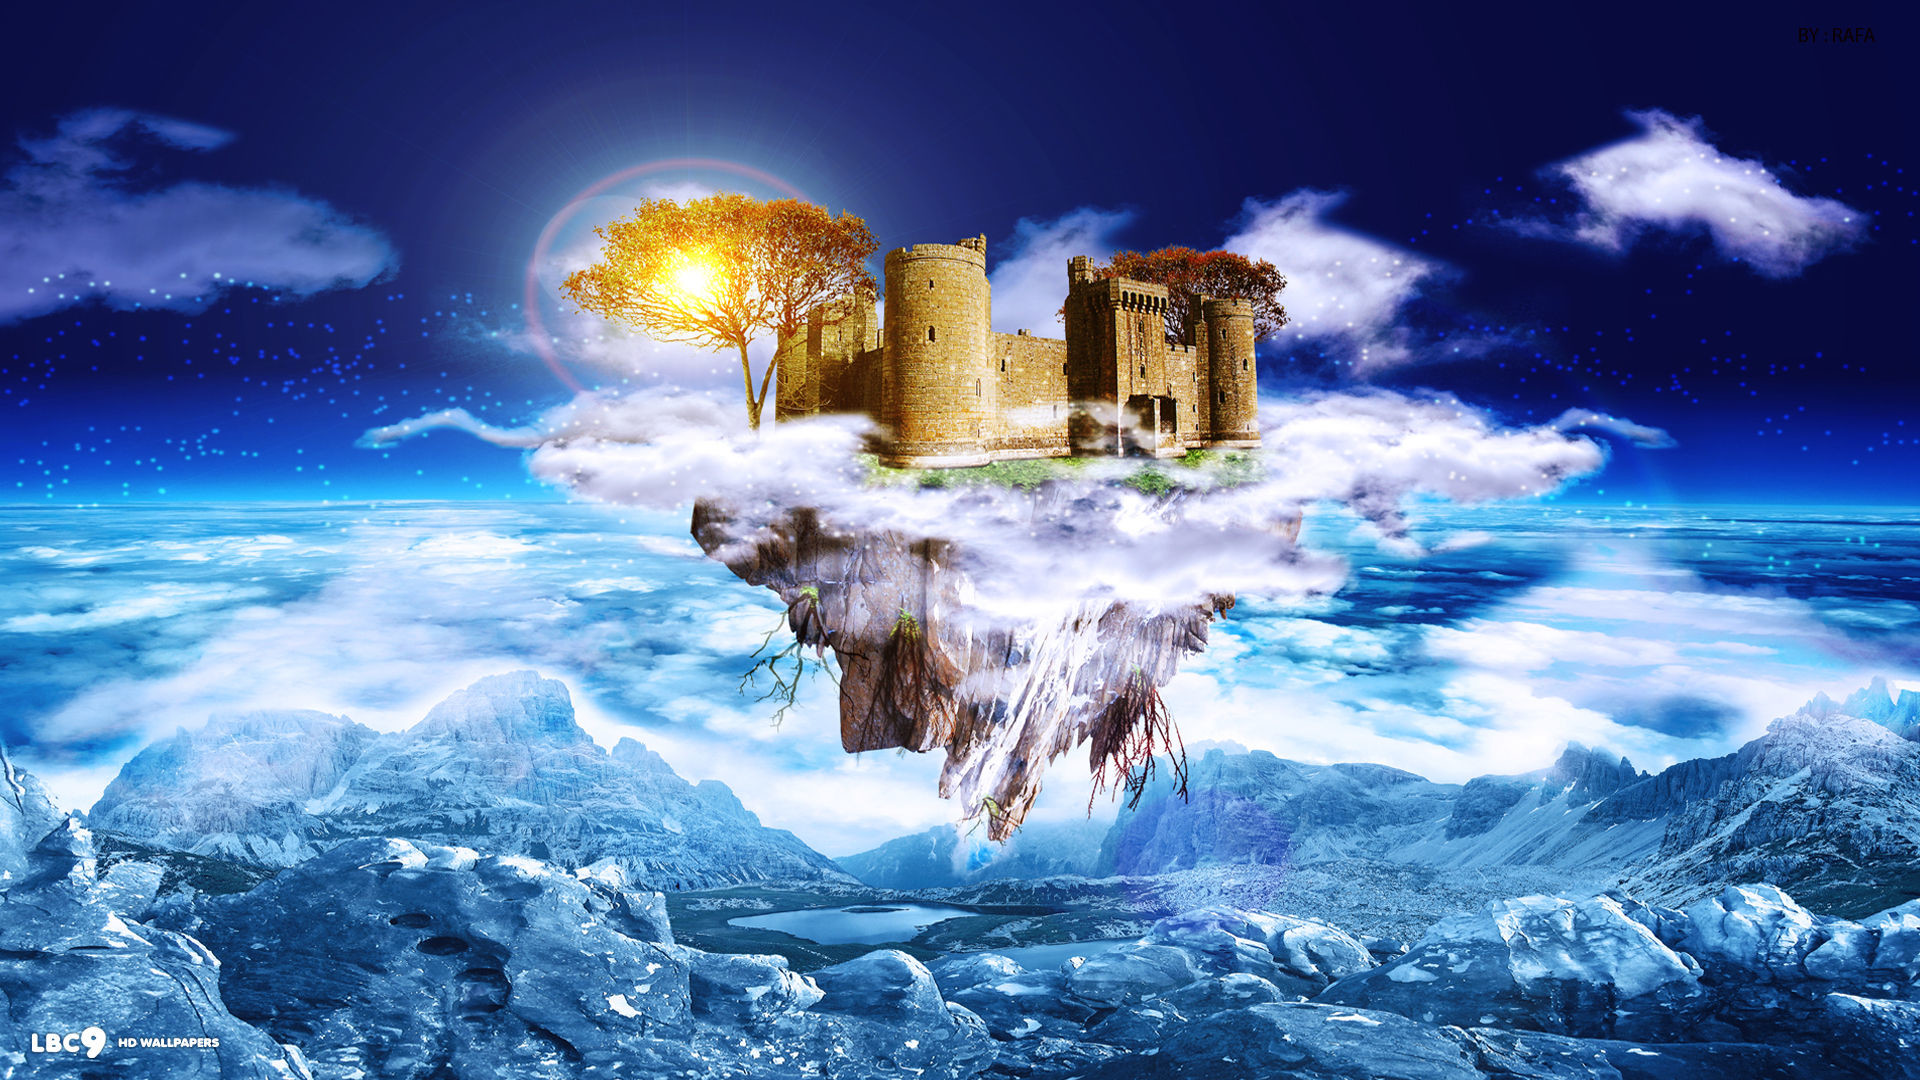 digital art dream castle